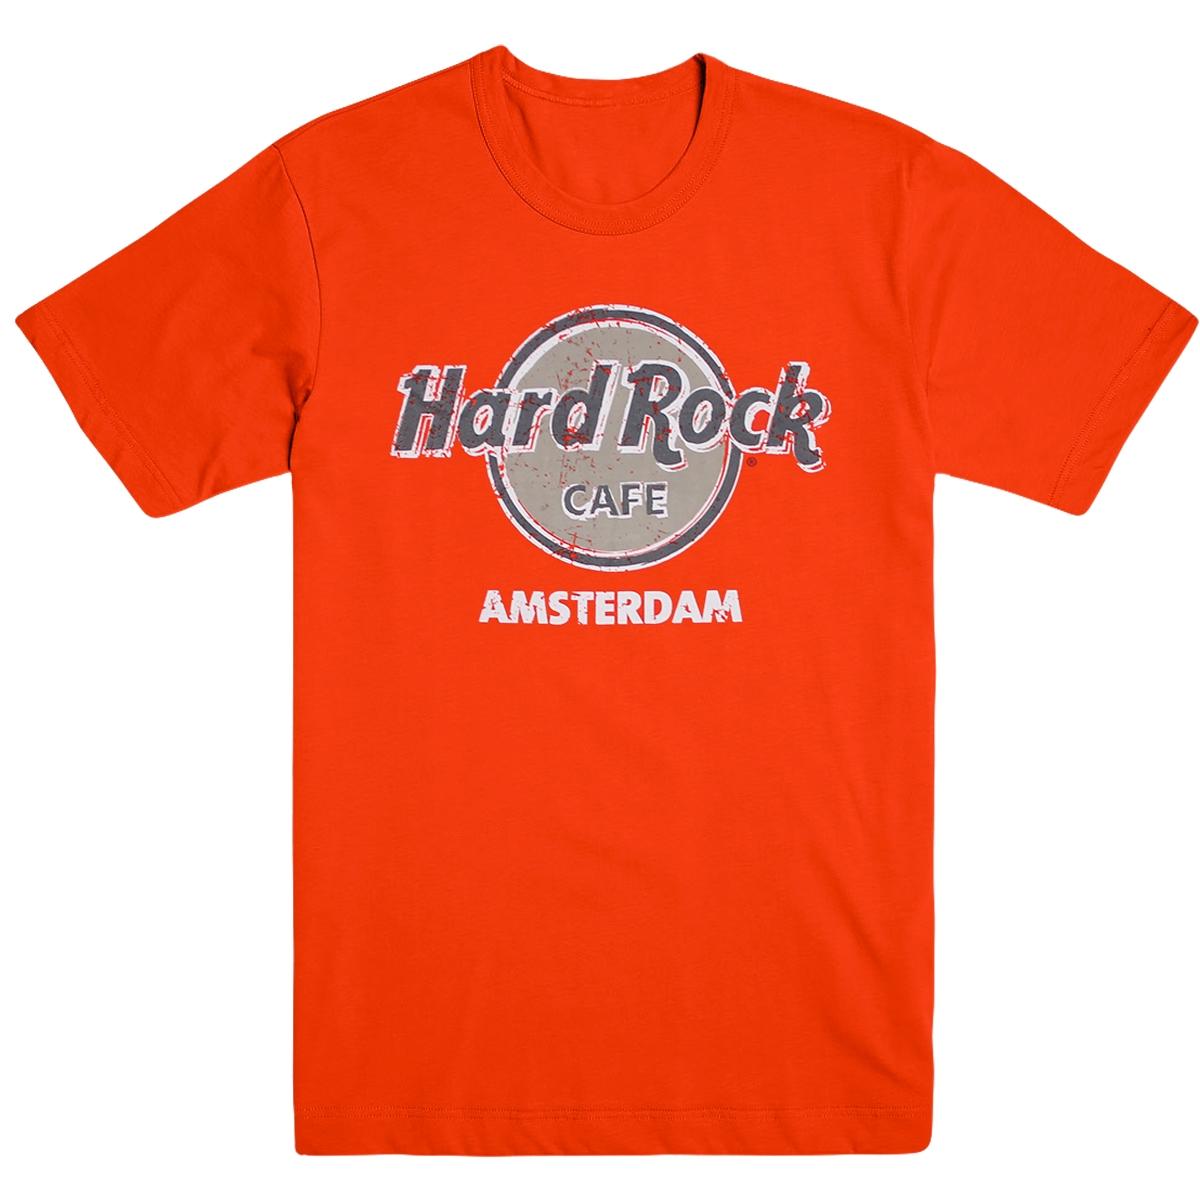 Throwback Logo Tee Amsterdam 0